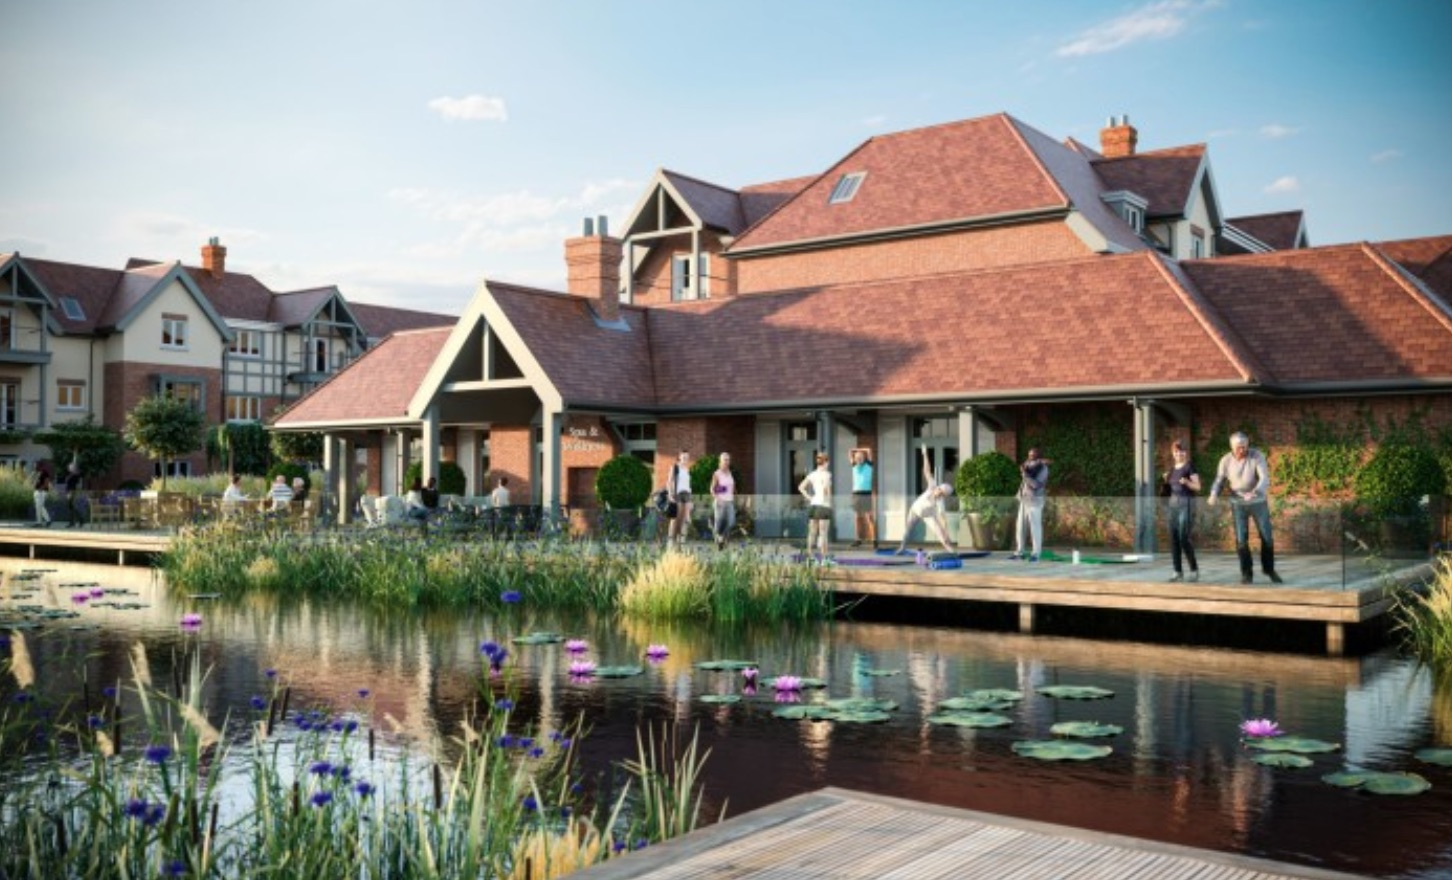 Willmott Dixon to develop £120m net-zero retirement village